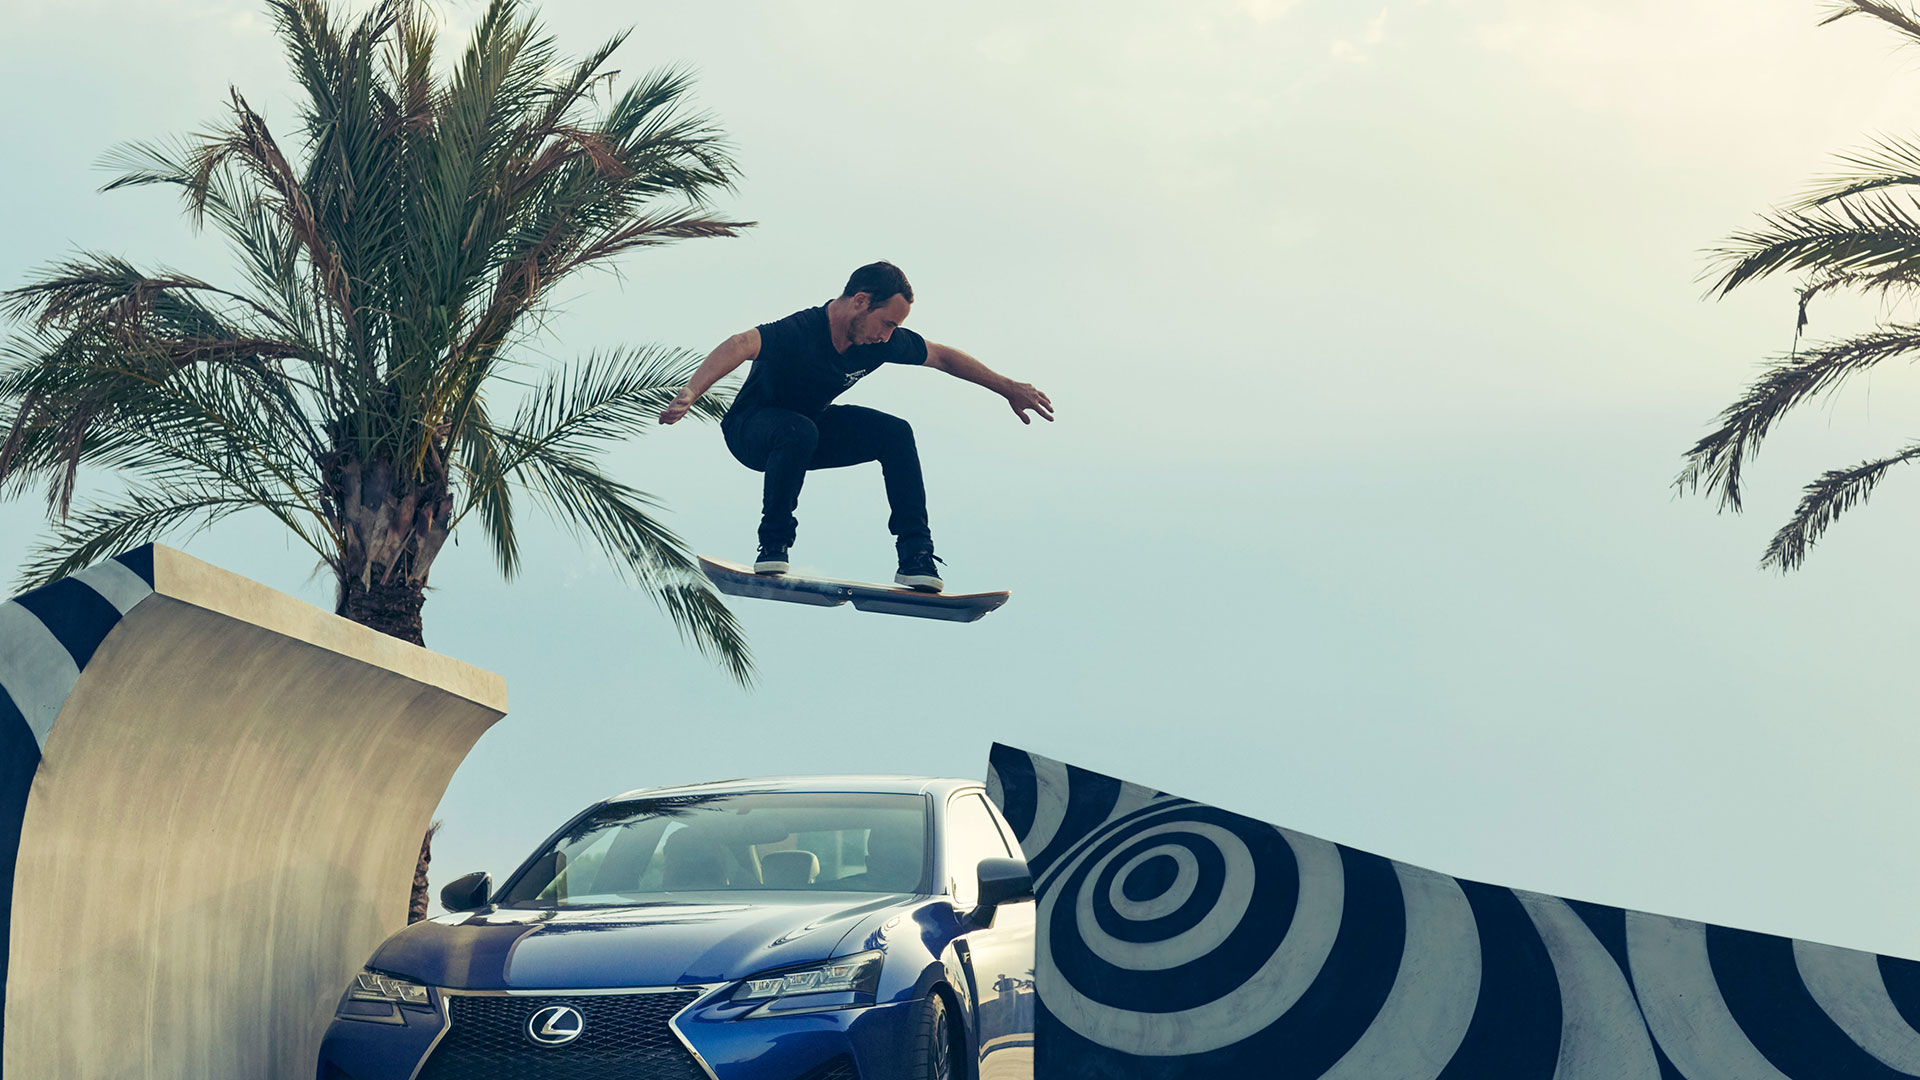 Programa Extracare a GS y RX Lexus hero asset